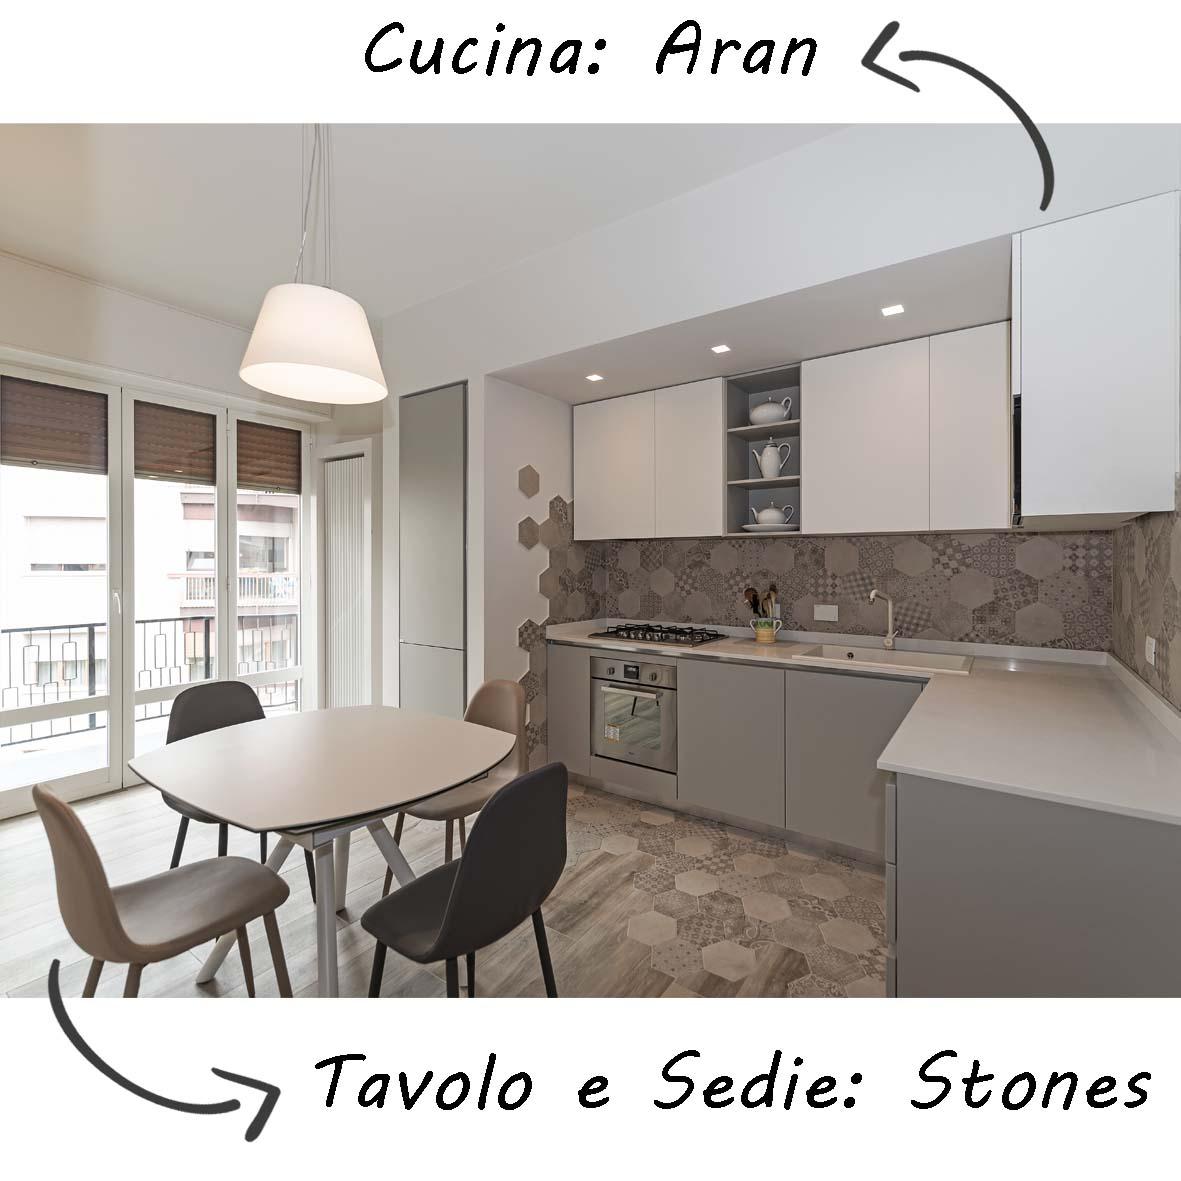 cucina-aran-sedie-tavolo-stones-centro dell'arredamento-savona